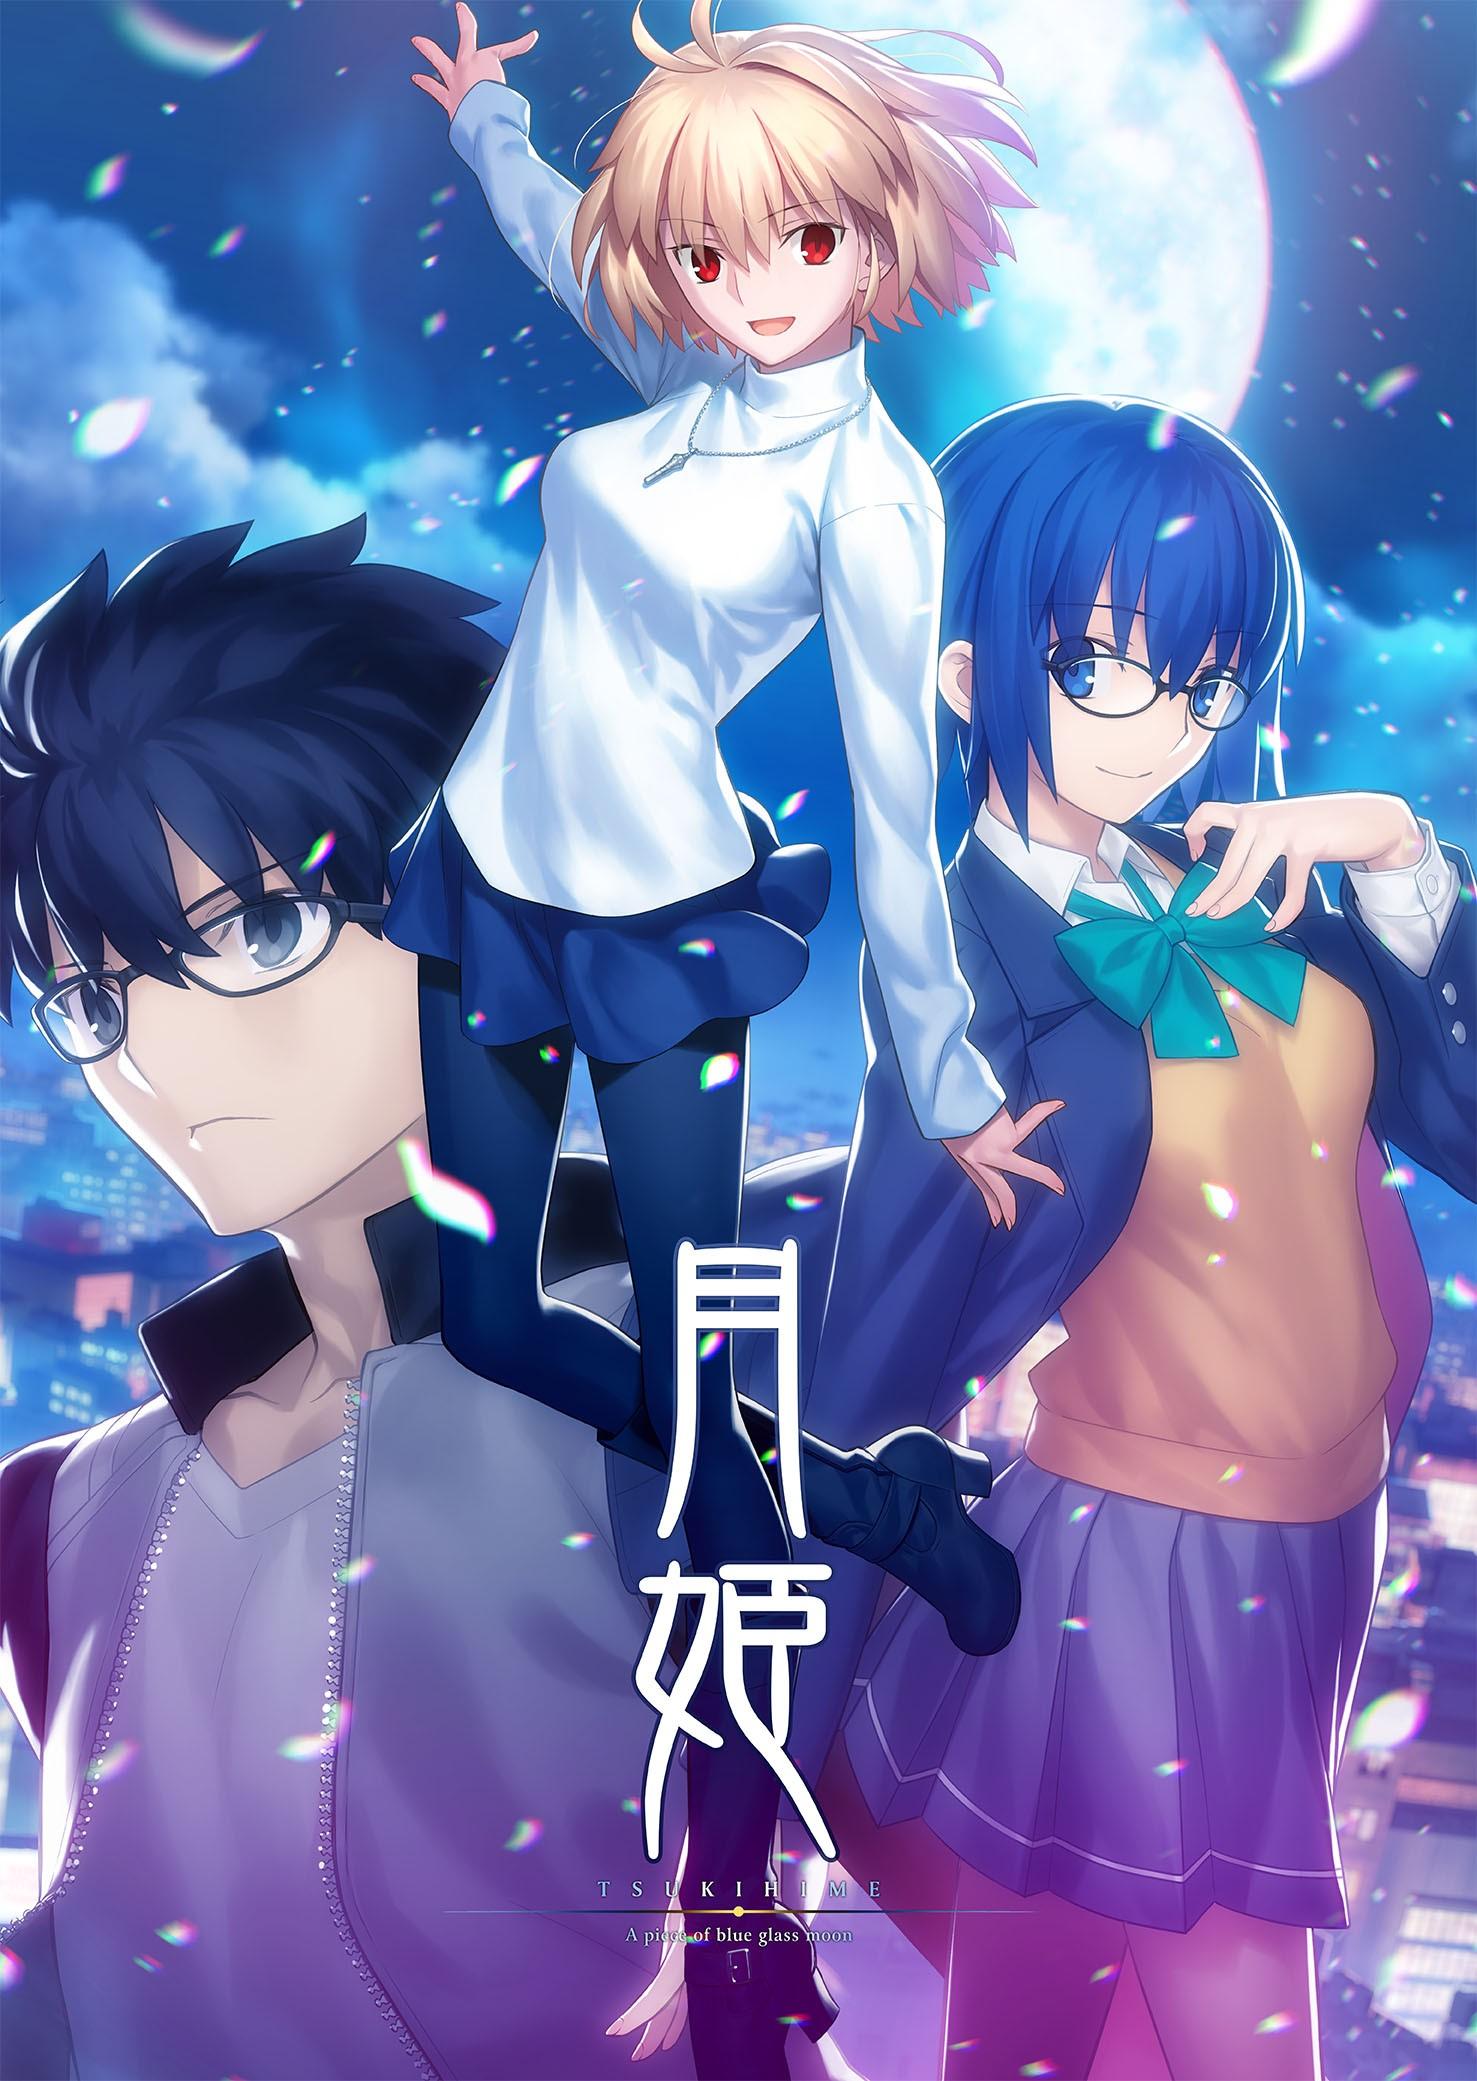 Tsukihime: A Piece of Blue Glass Moon